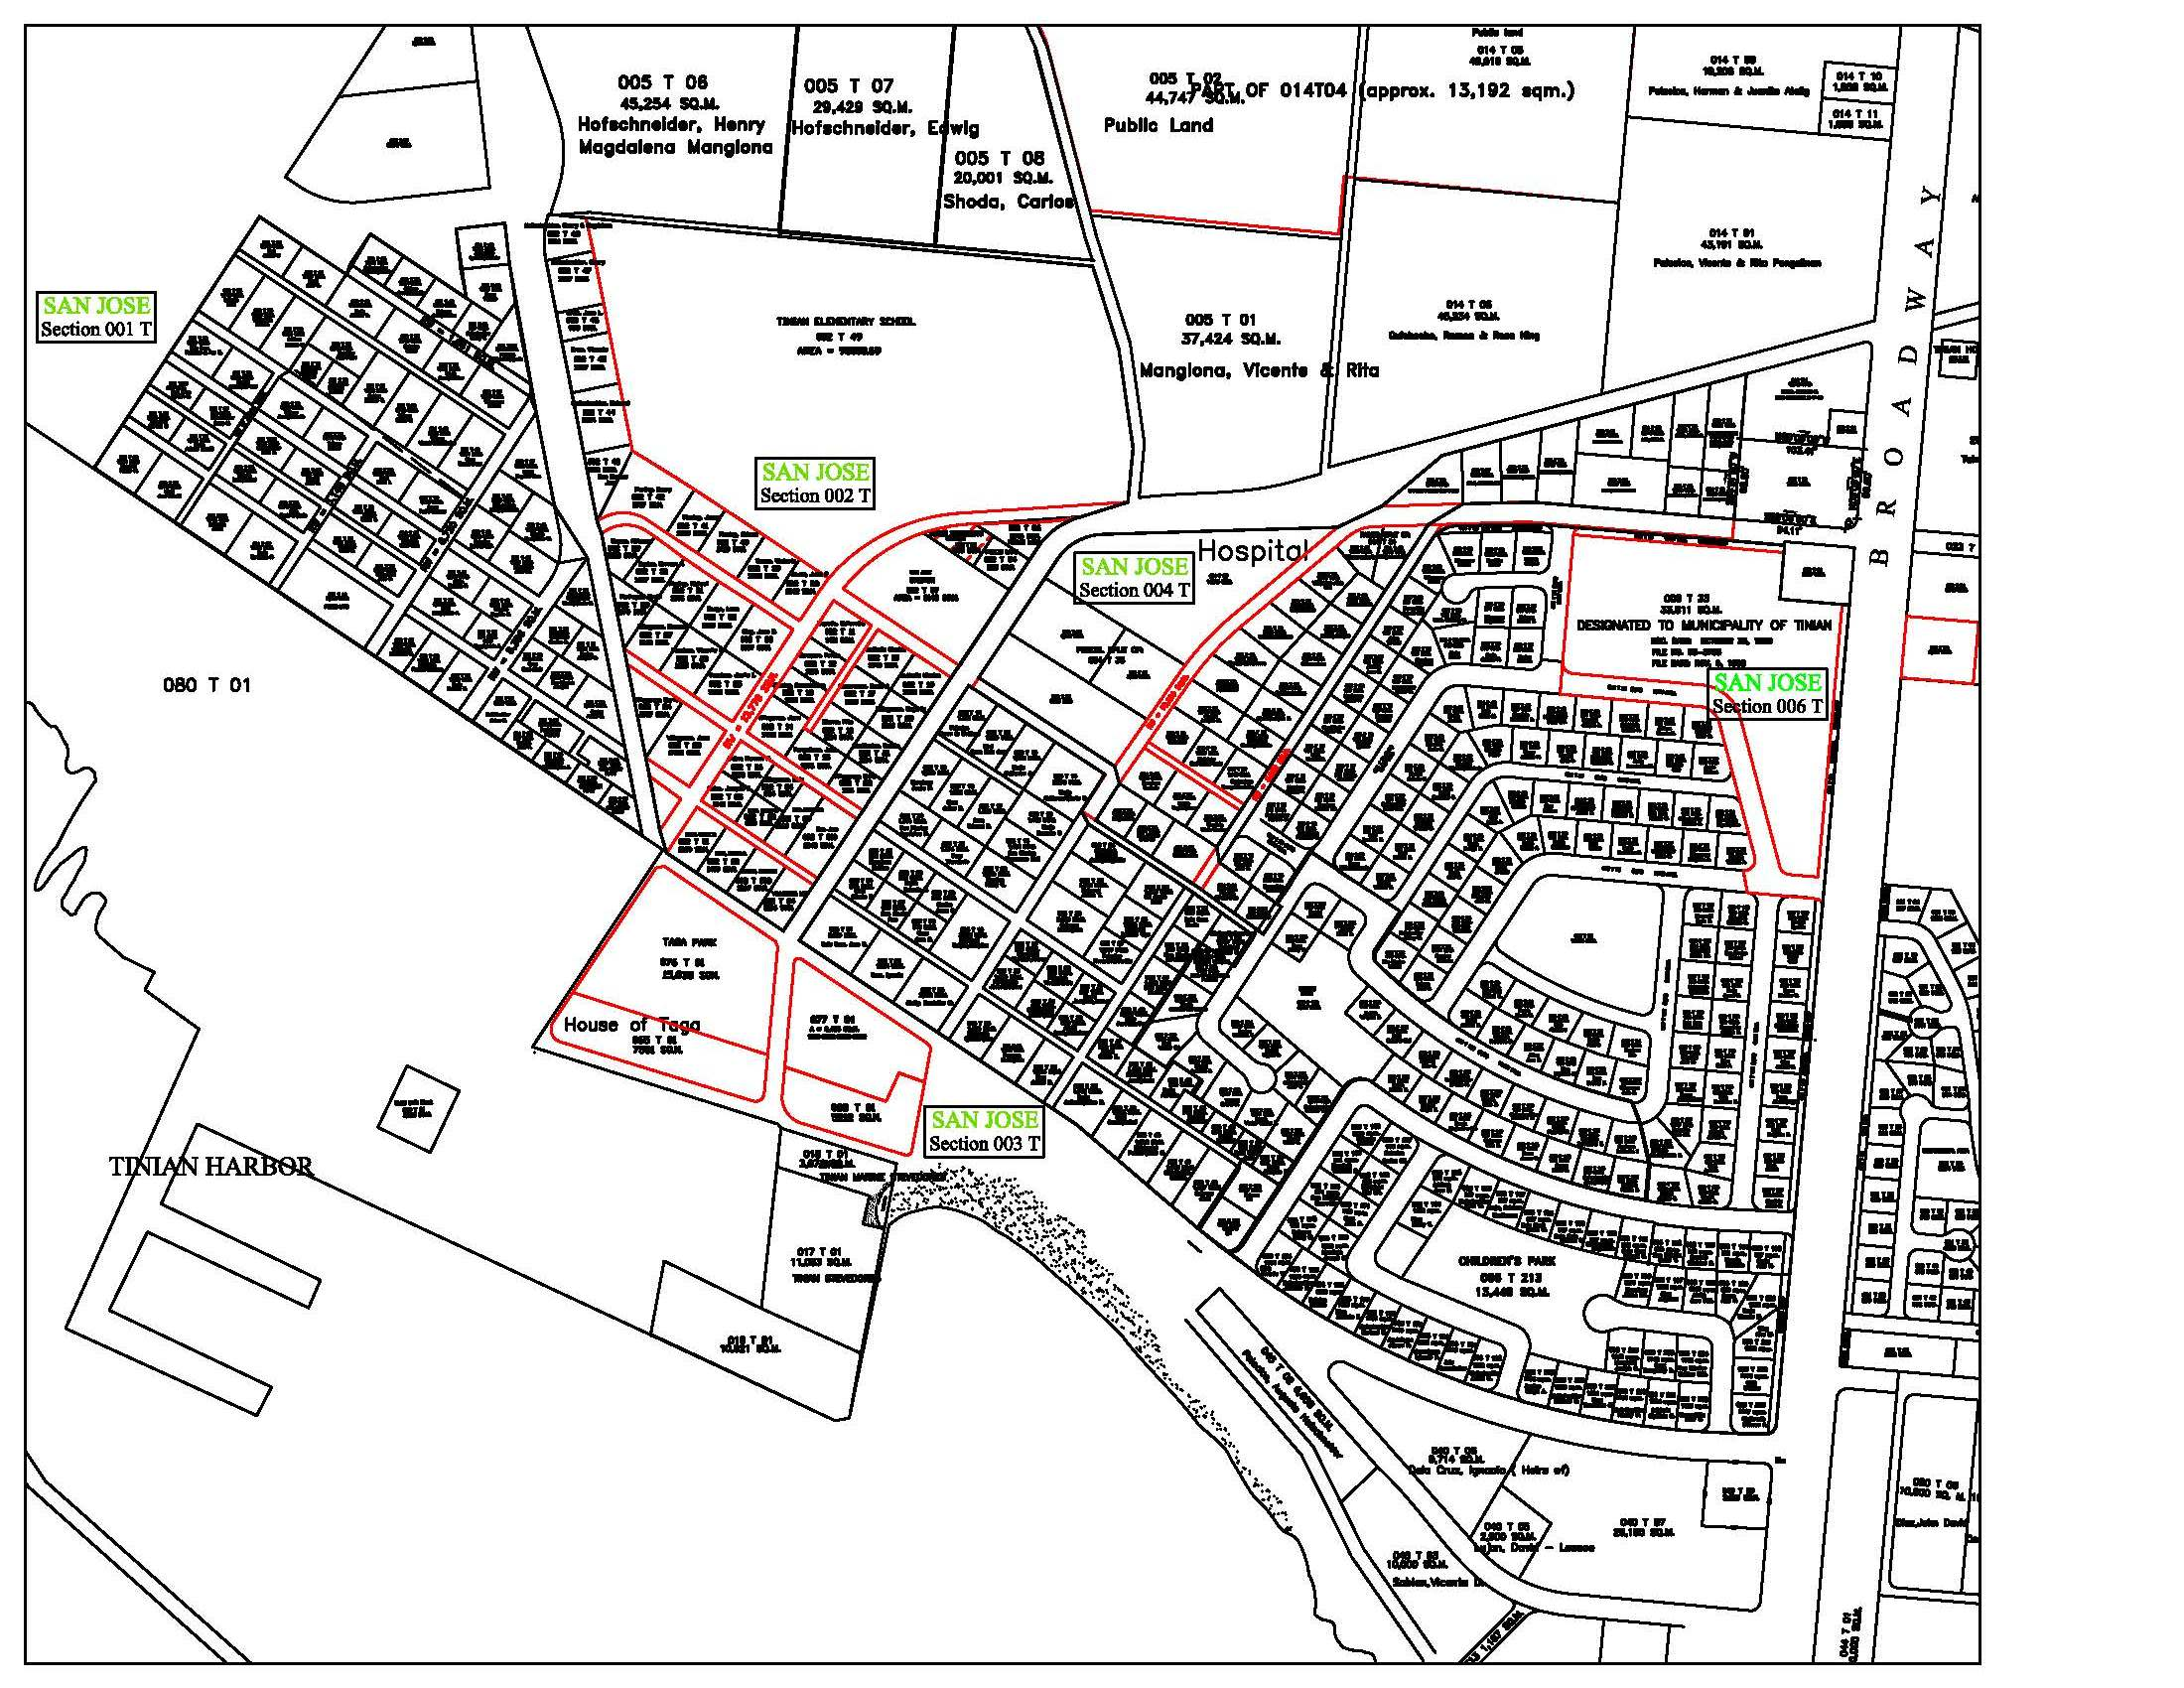 tinian village maps